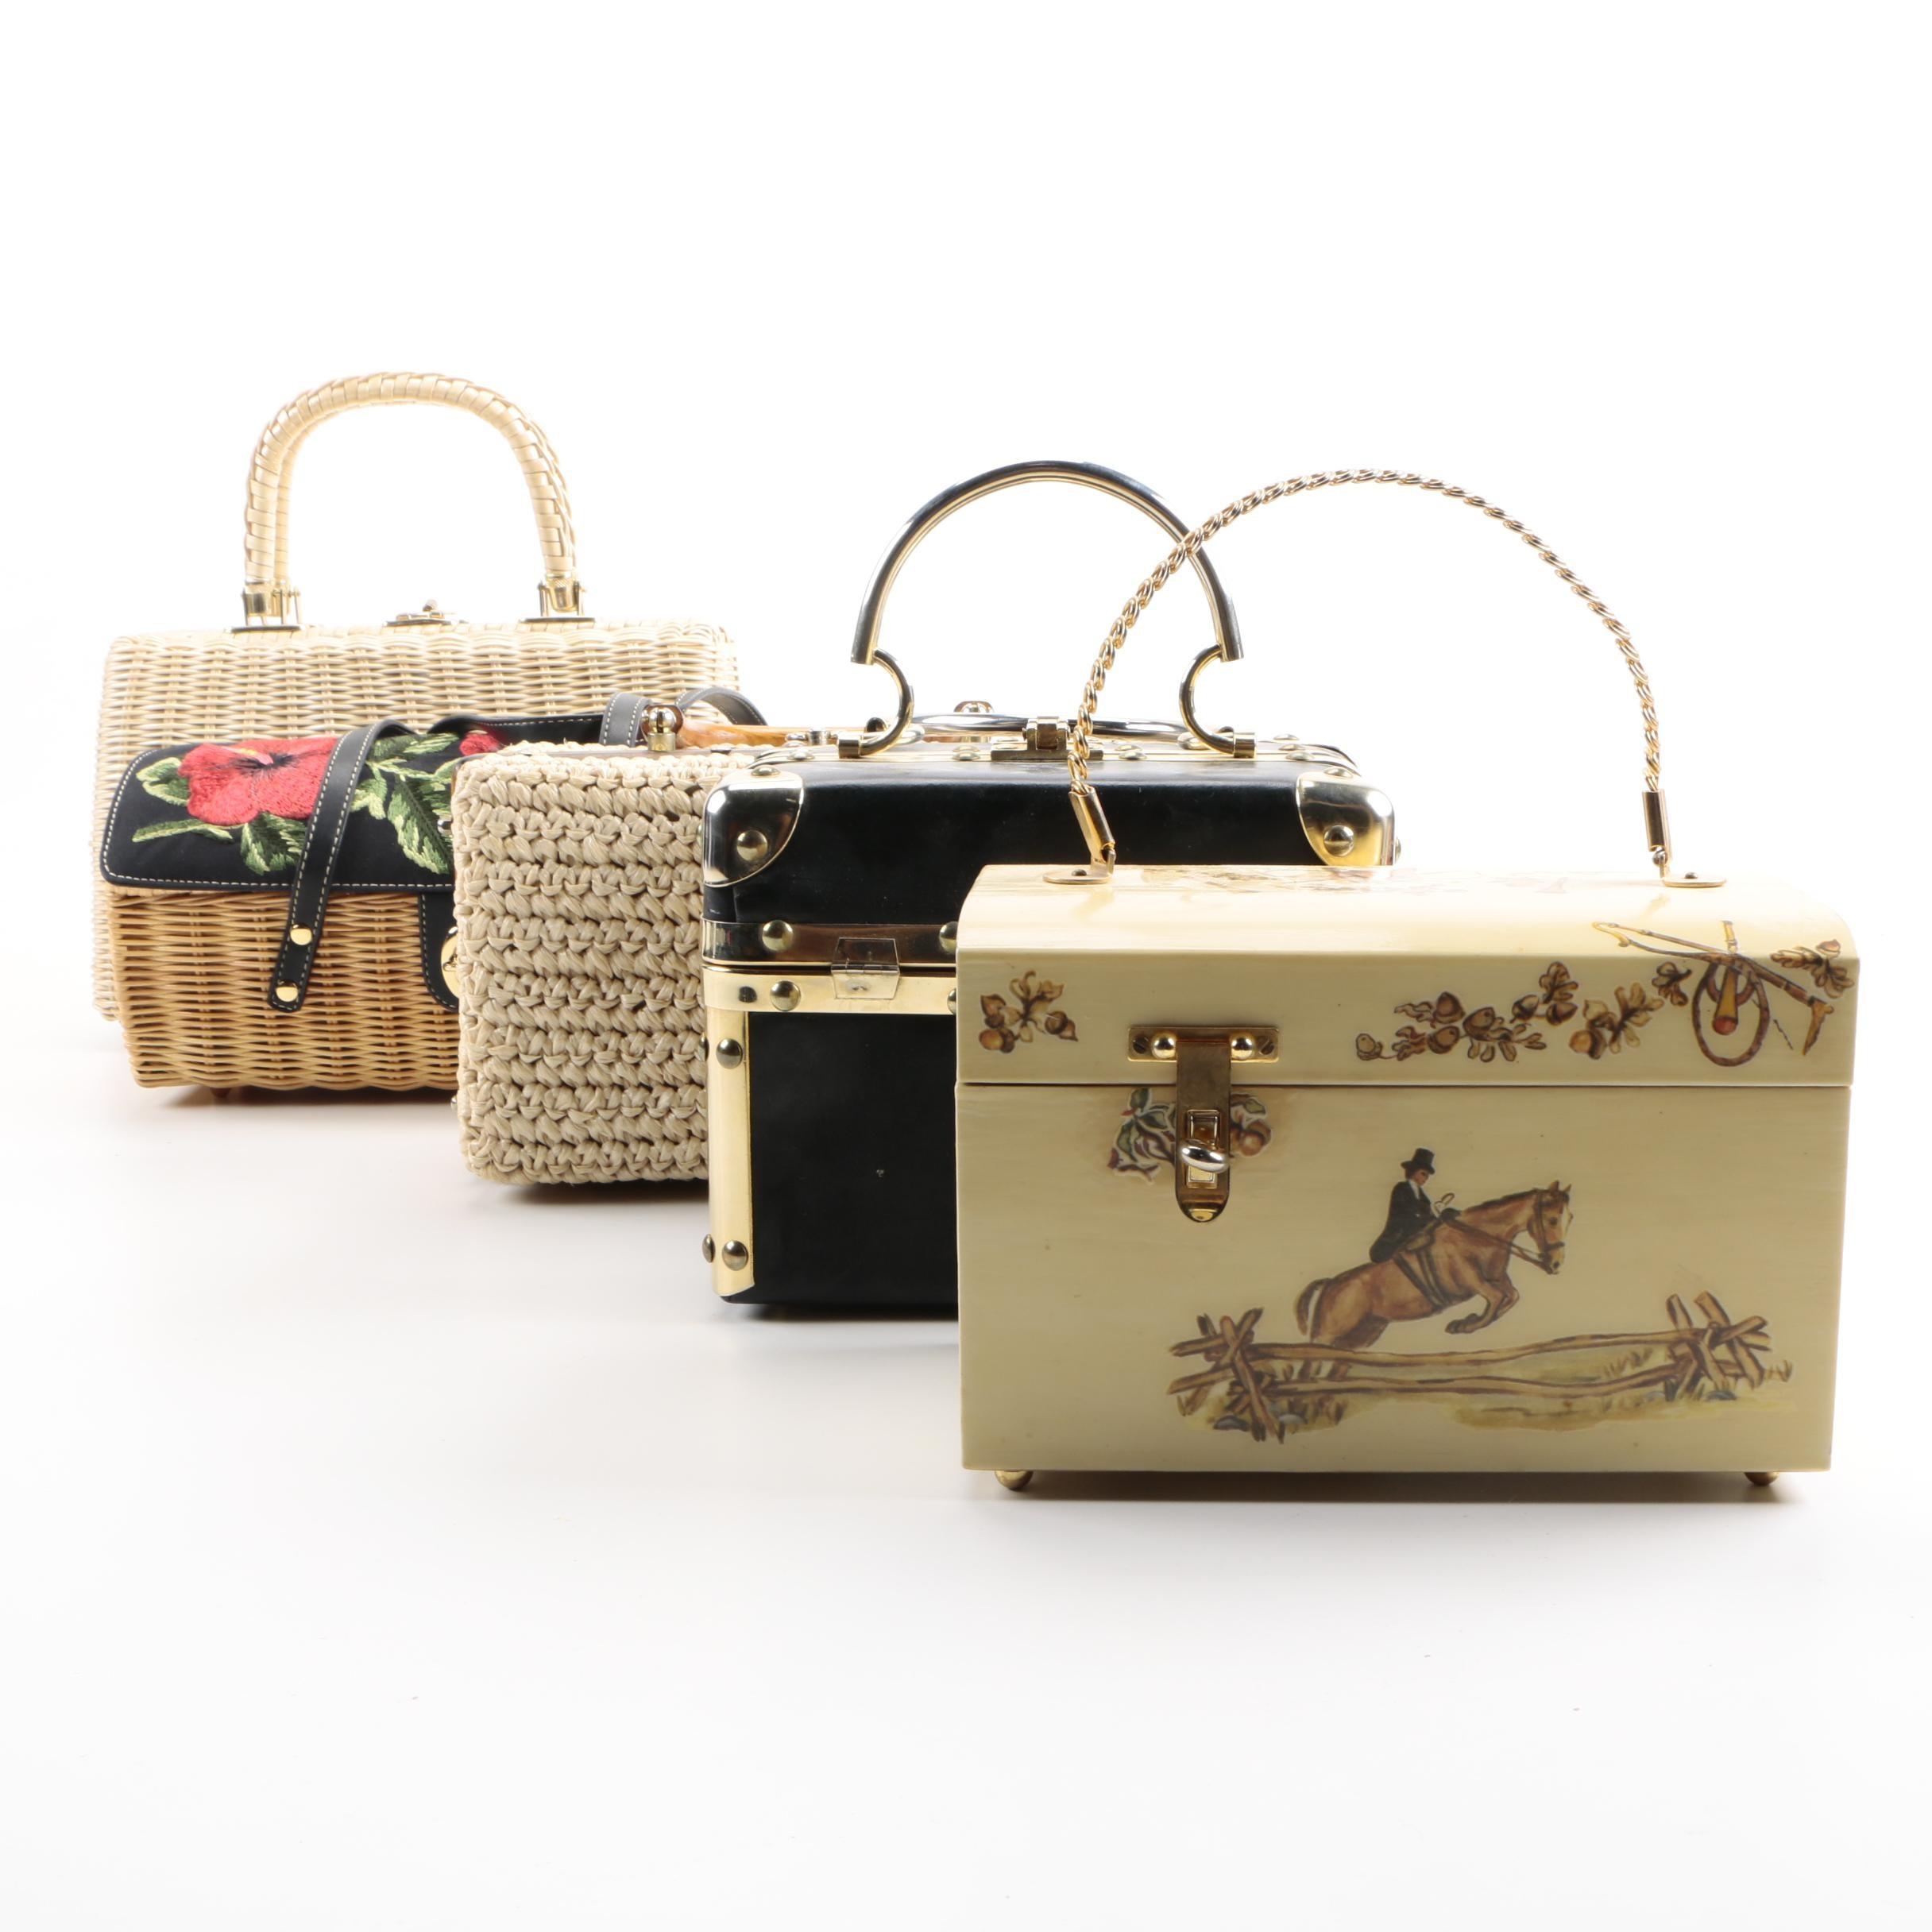 Vintage Handbags and Box Purses Including Fleurette of Miami